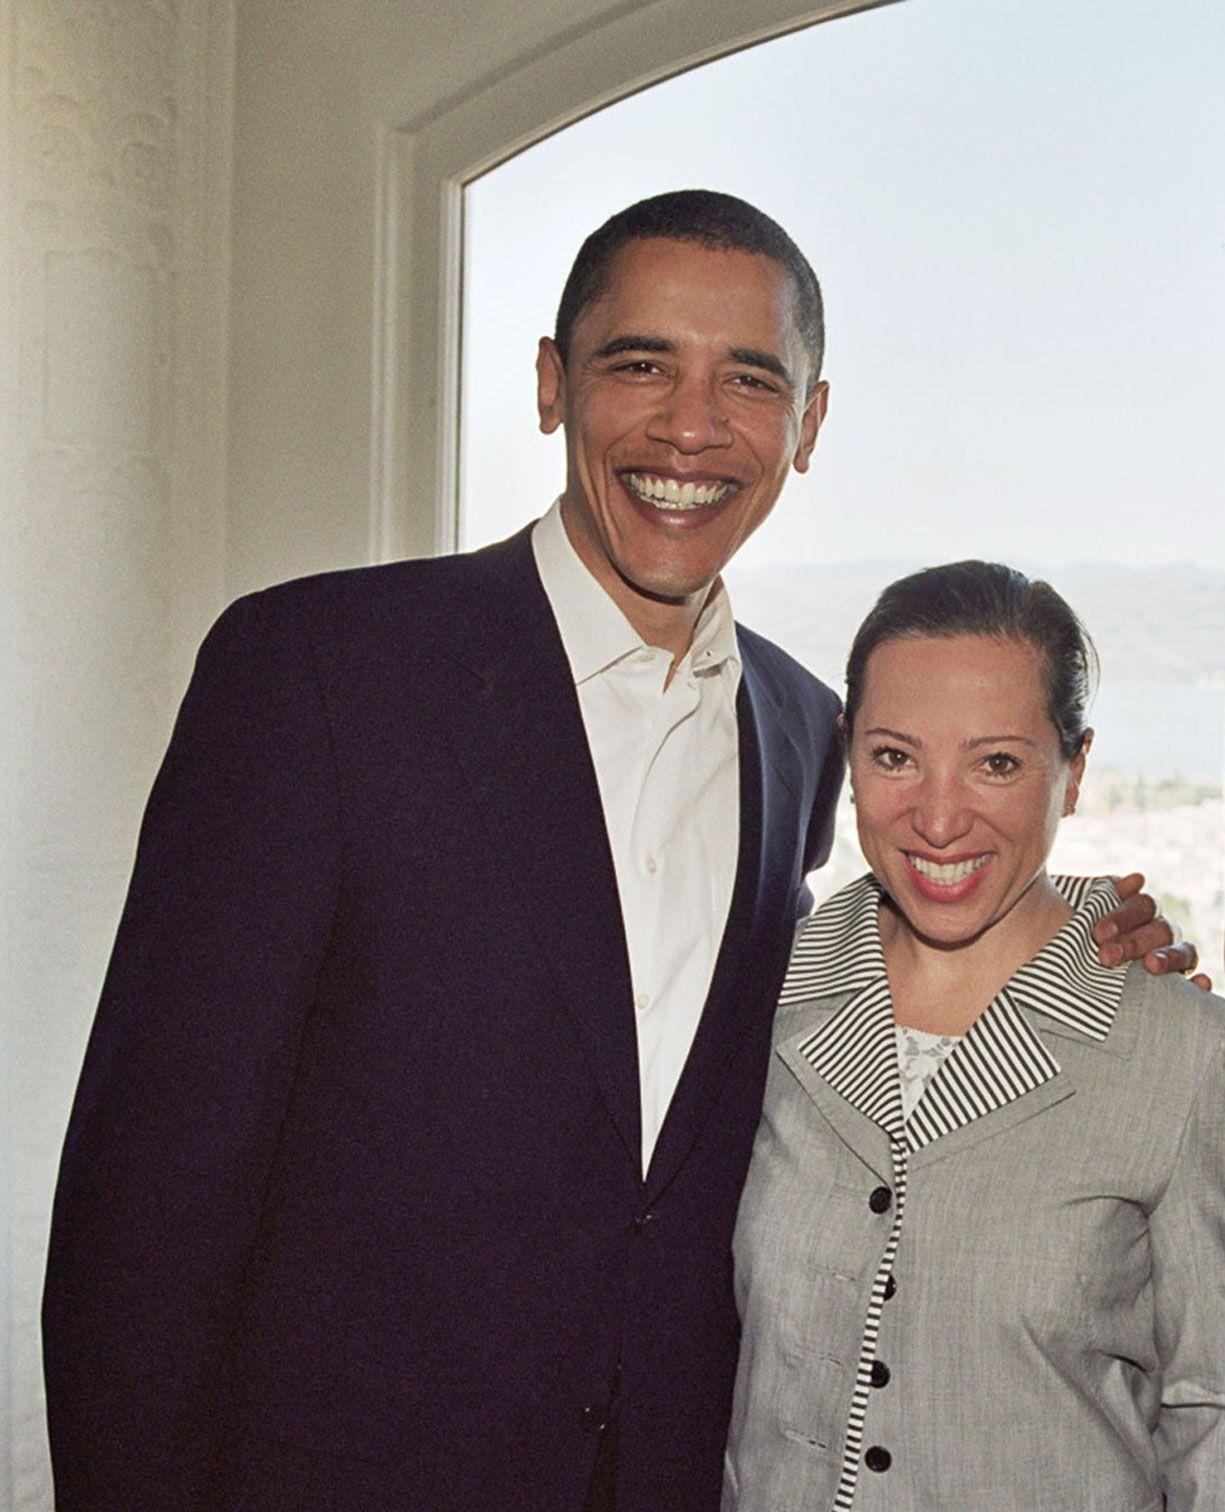 Eleni with President Obama